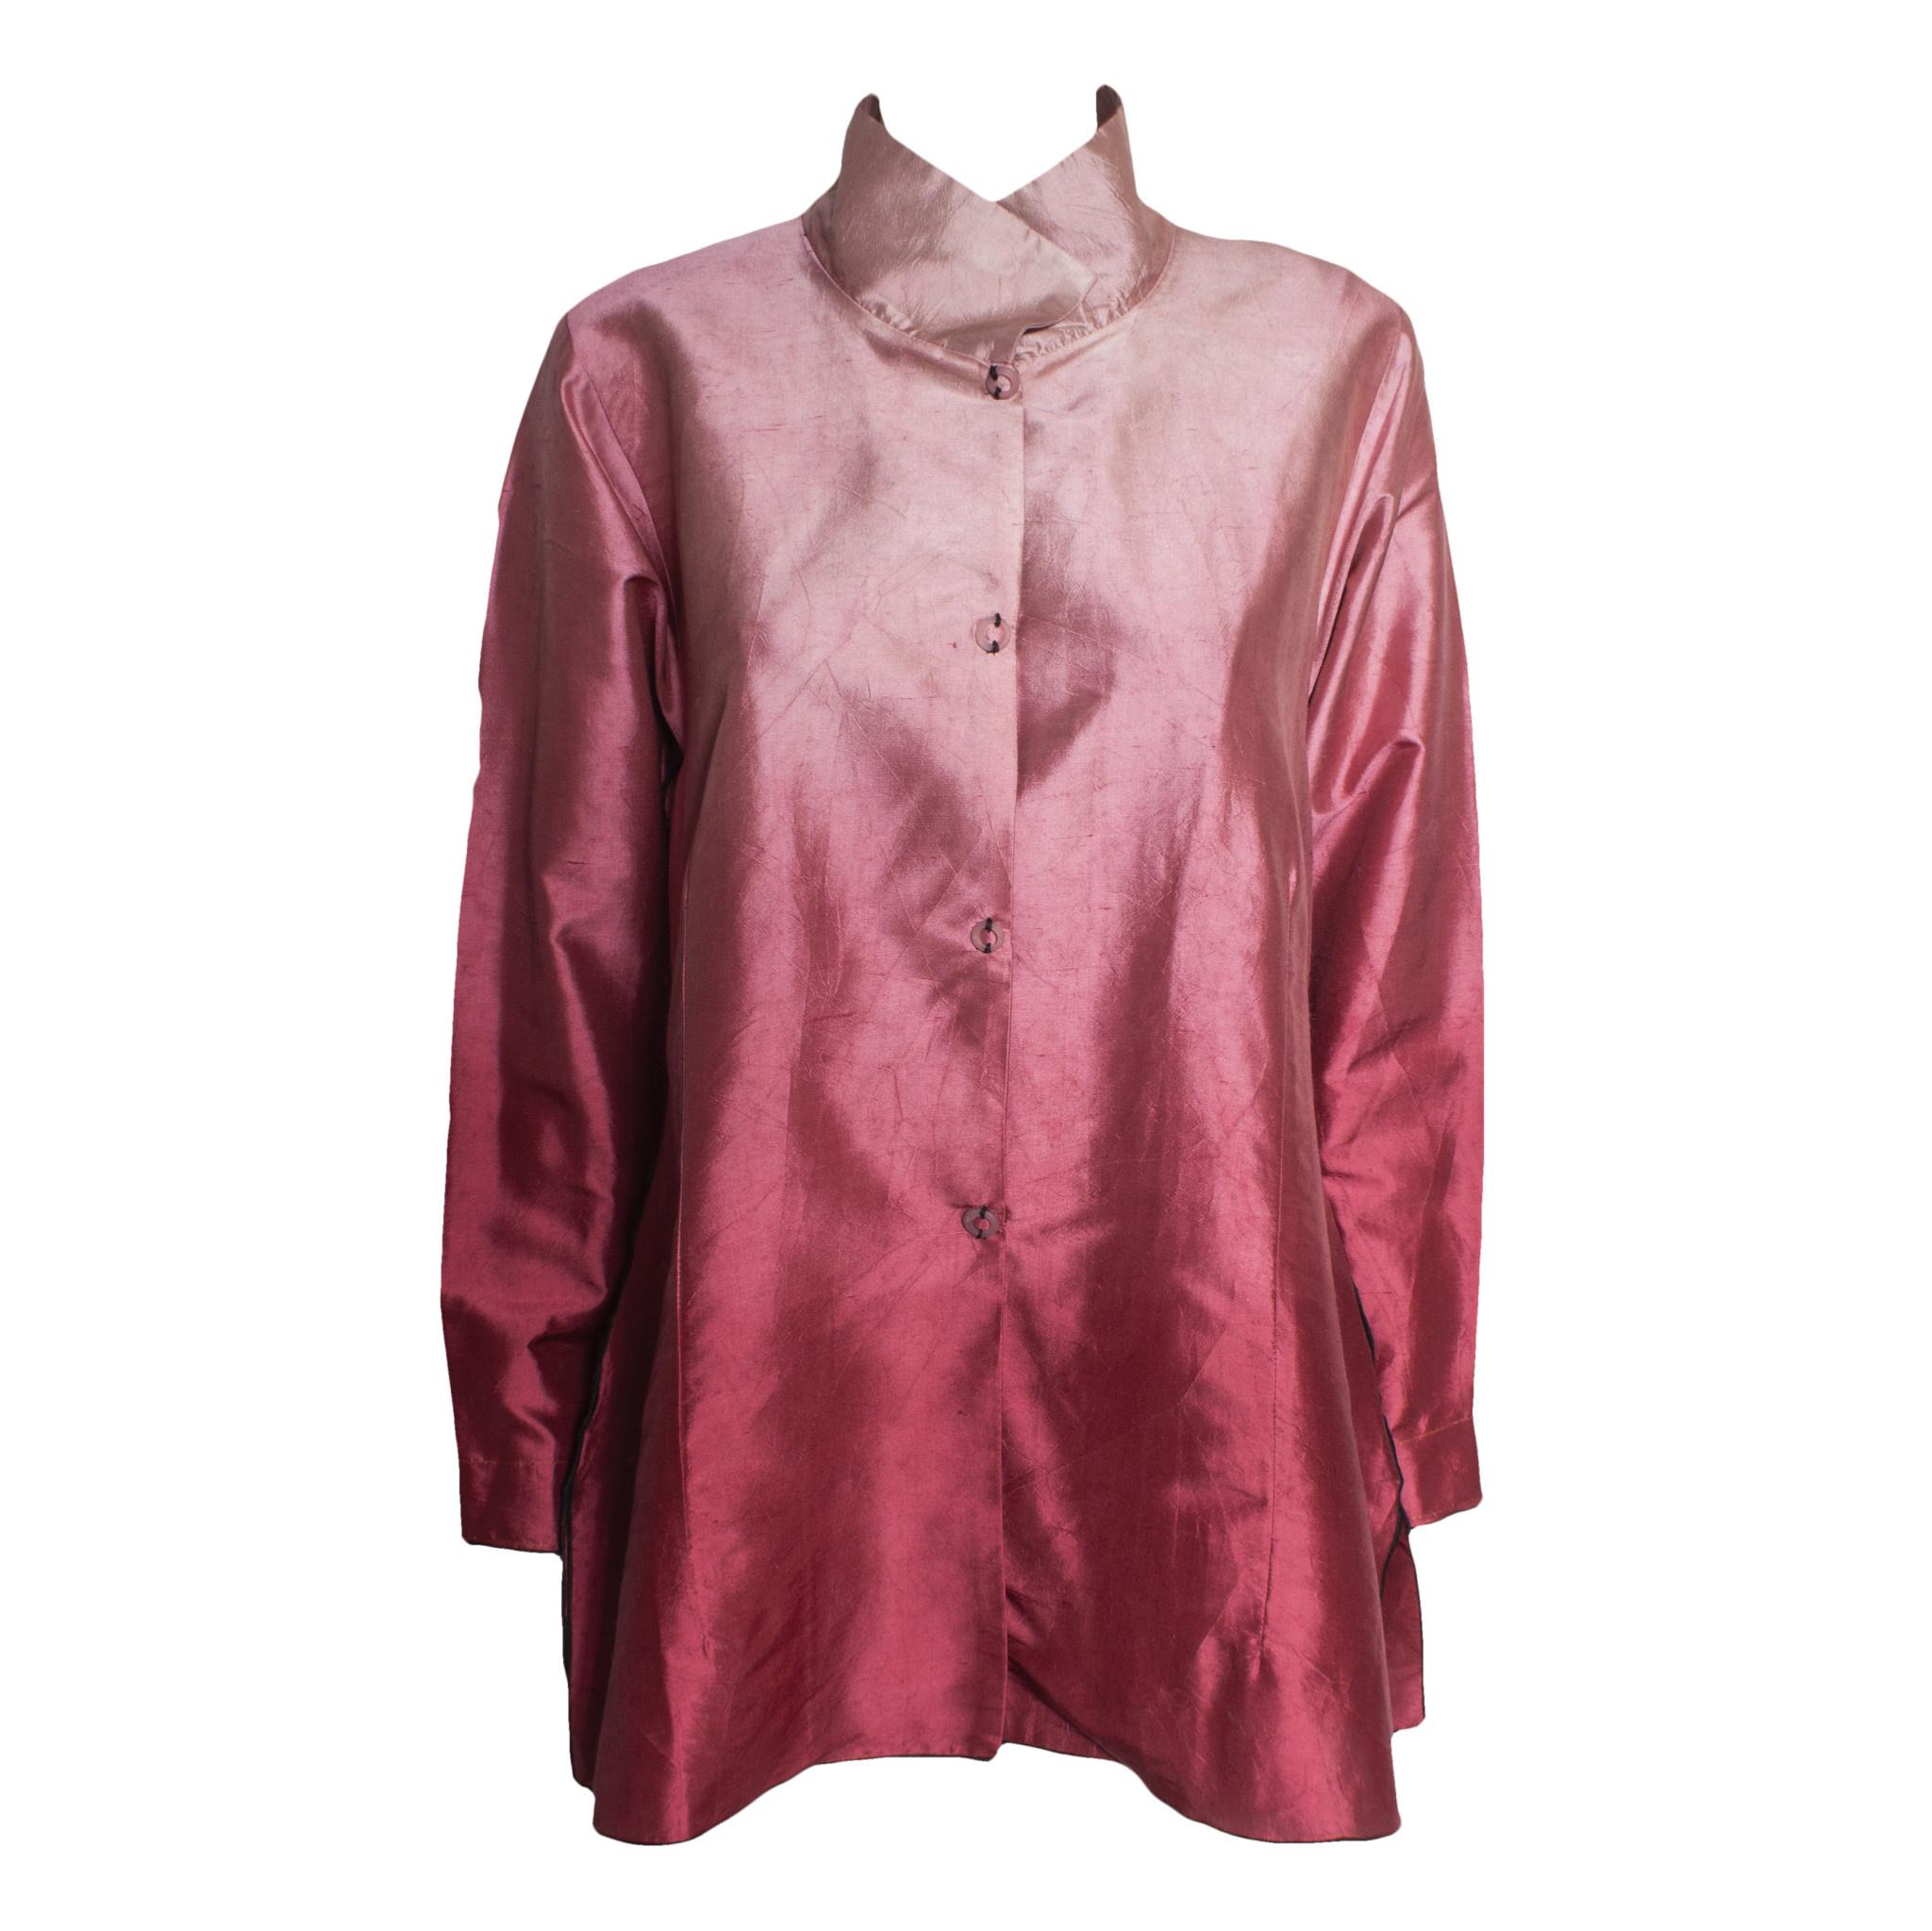 Deborah Cross Deborah Cross Fitted Shirt - Pink